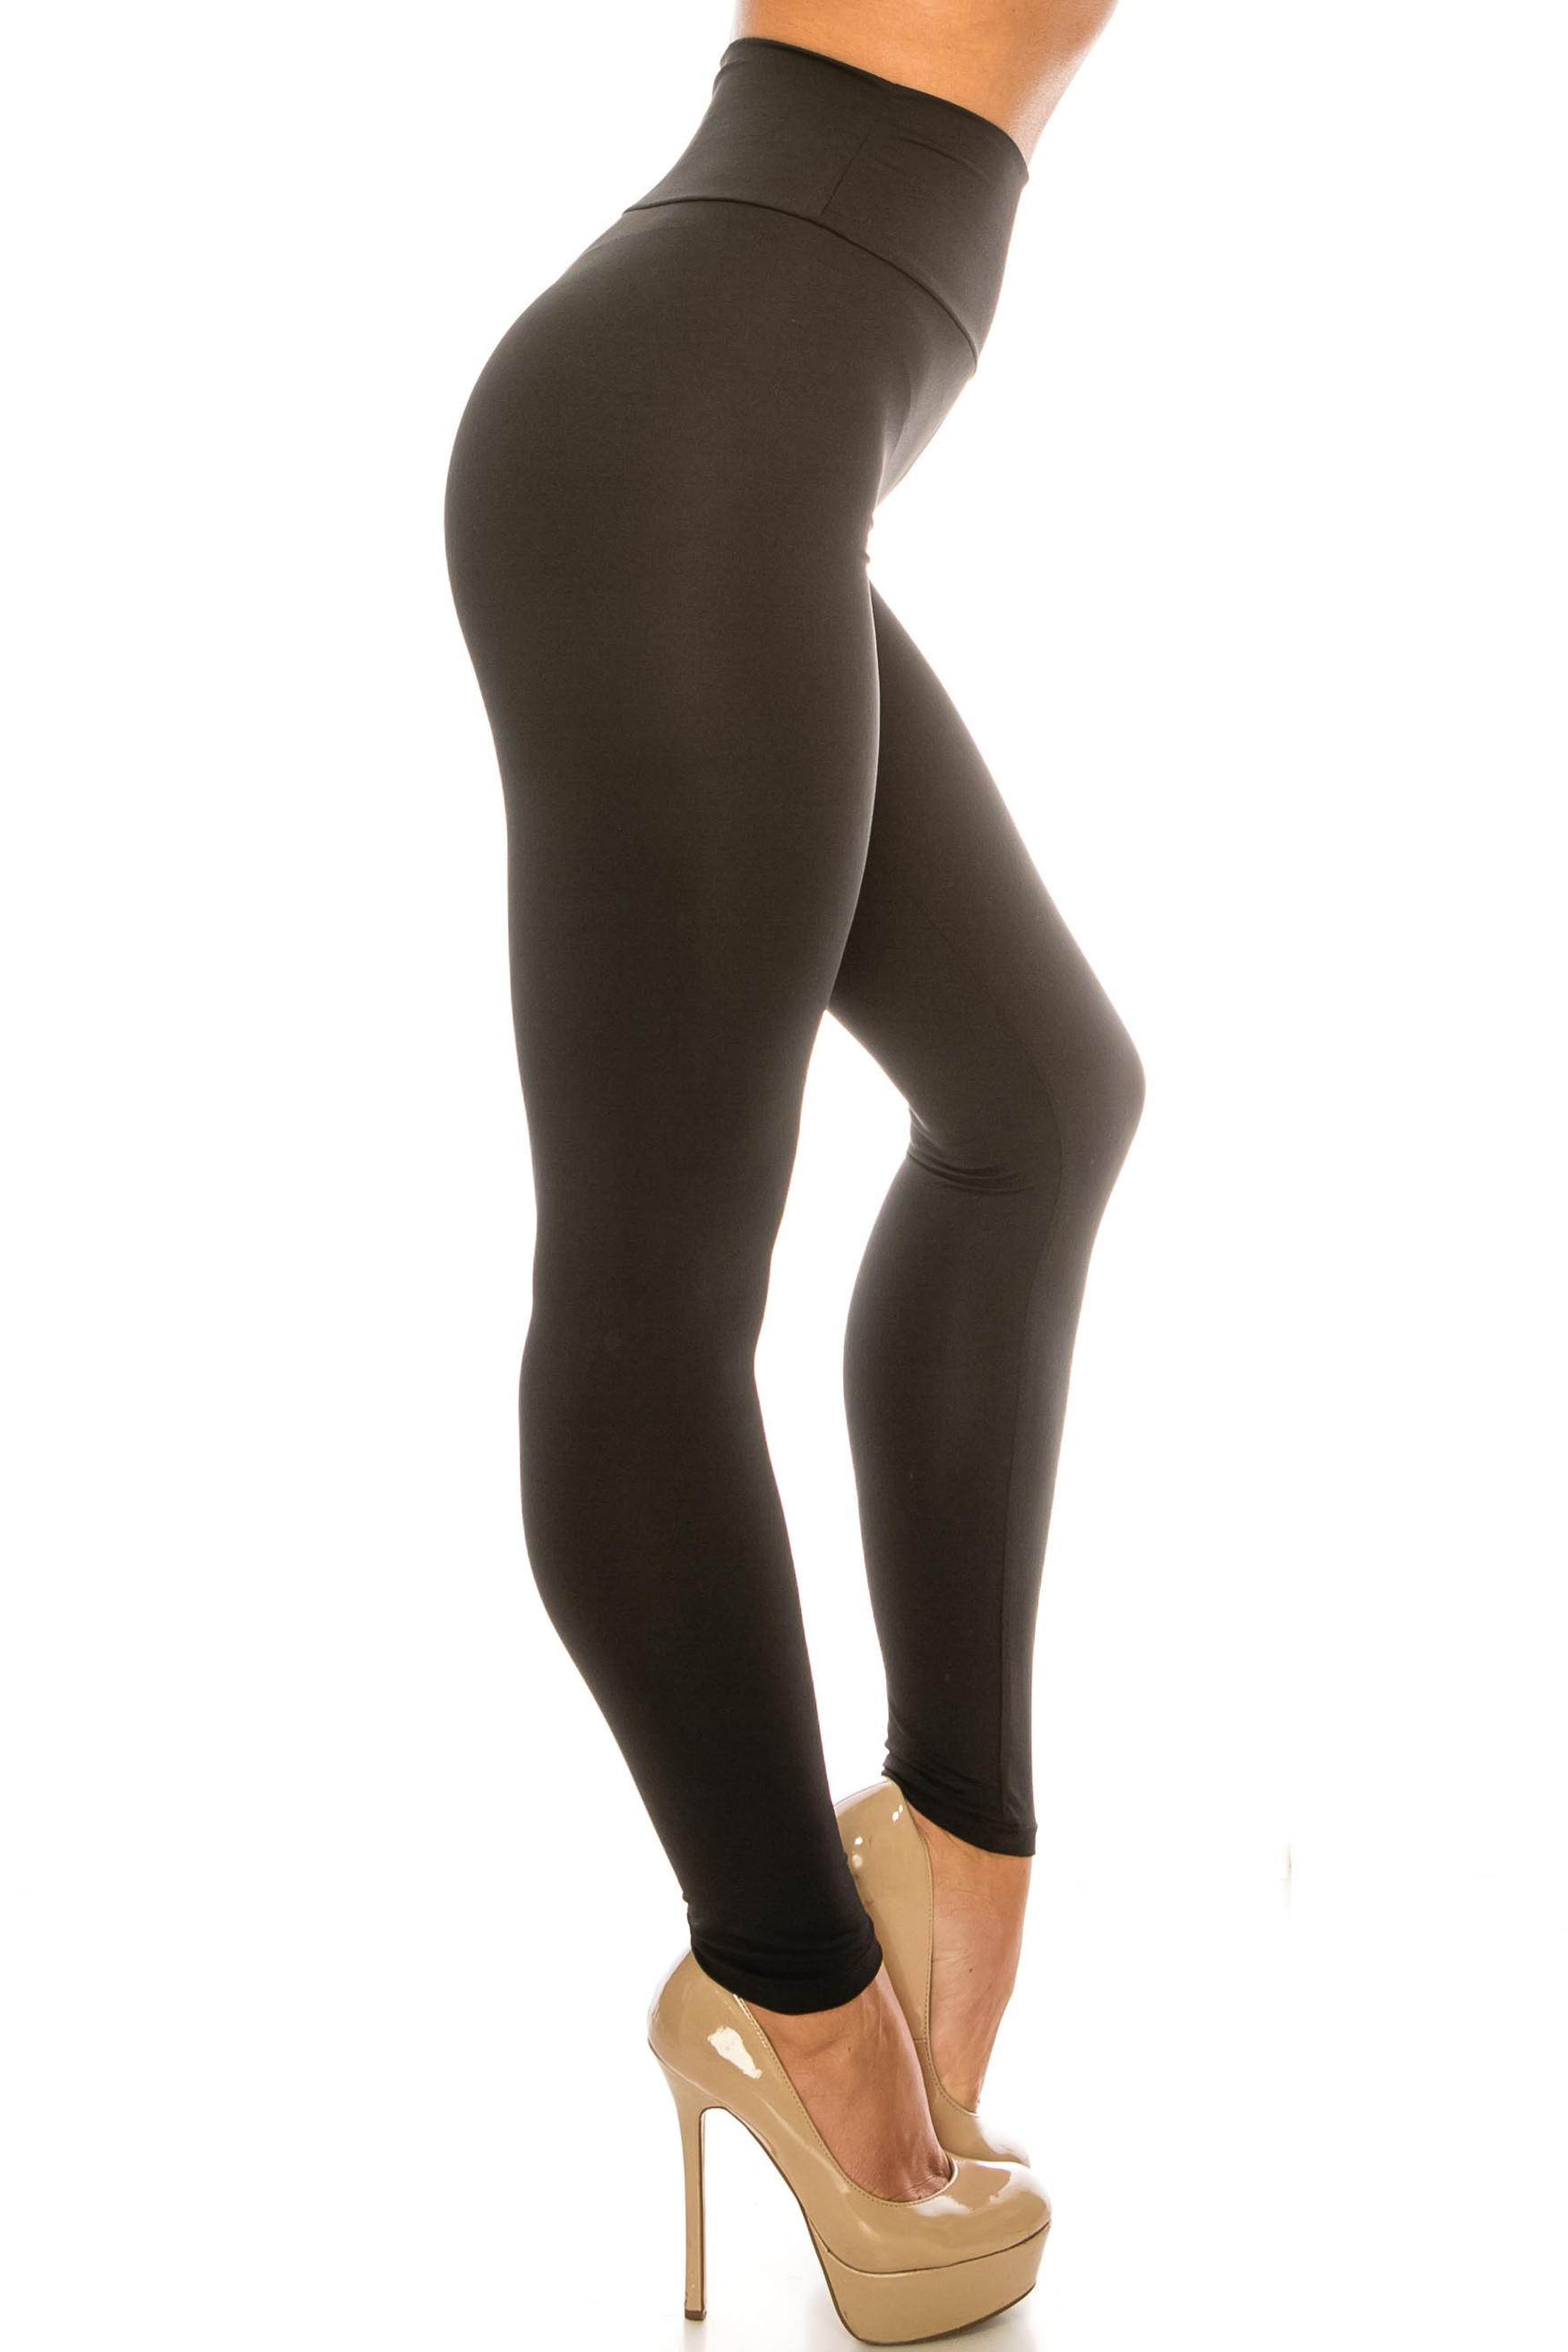 USA Basic High Waisted Athleisure Leggings